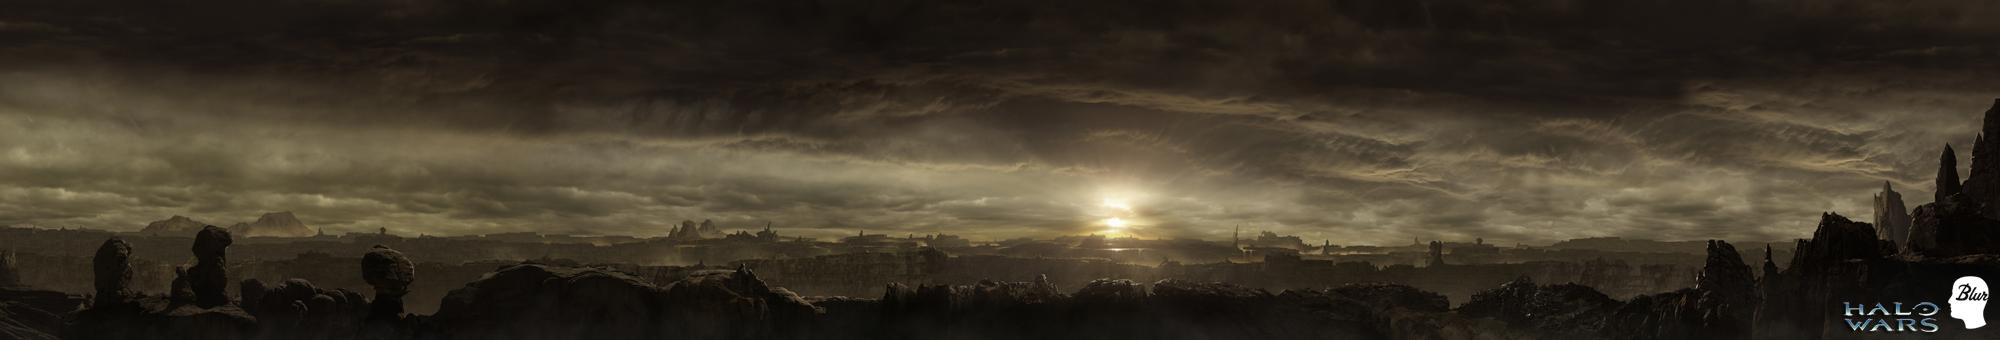 Halo wars big panorama by JJasso